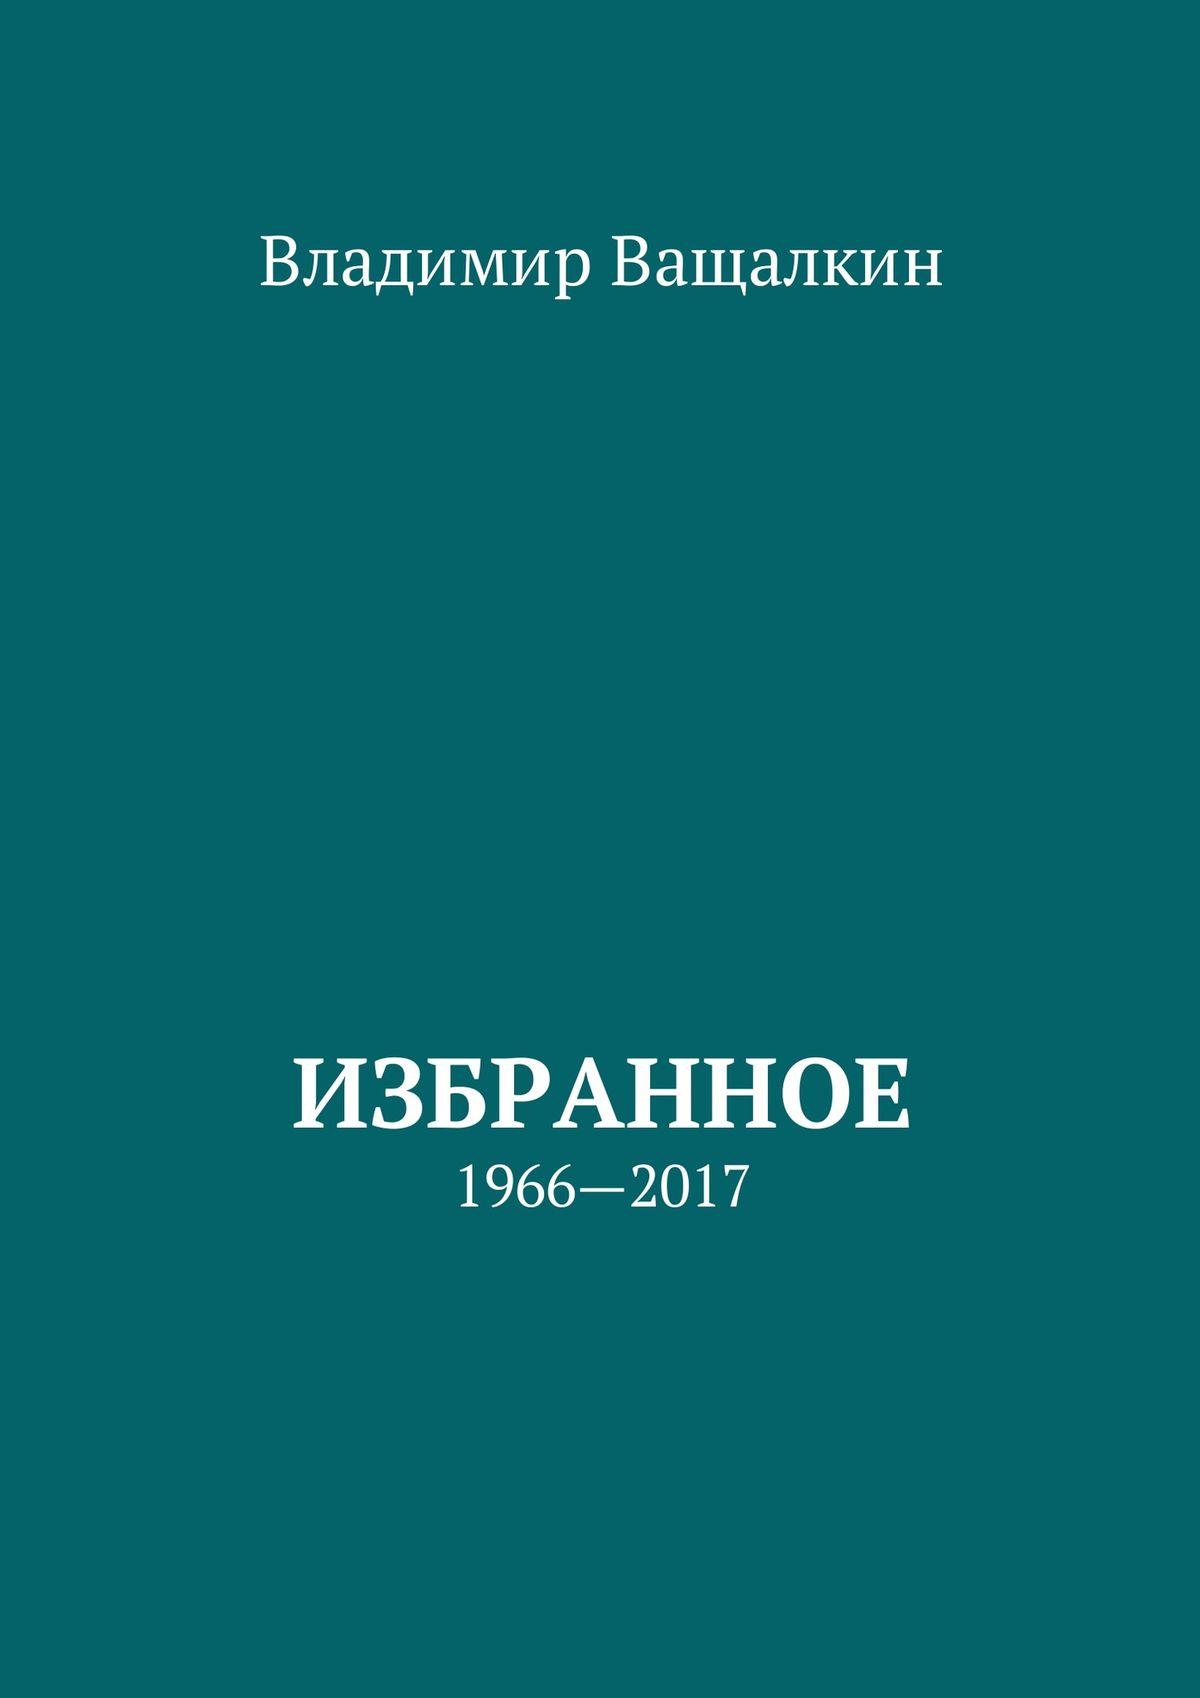 Владимир Алексеевич Ващалкин Избранное. 1966—2017 бергольо х скорка а о небесном и о земном